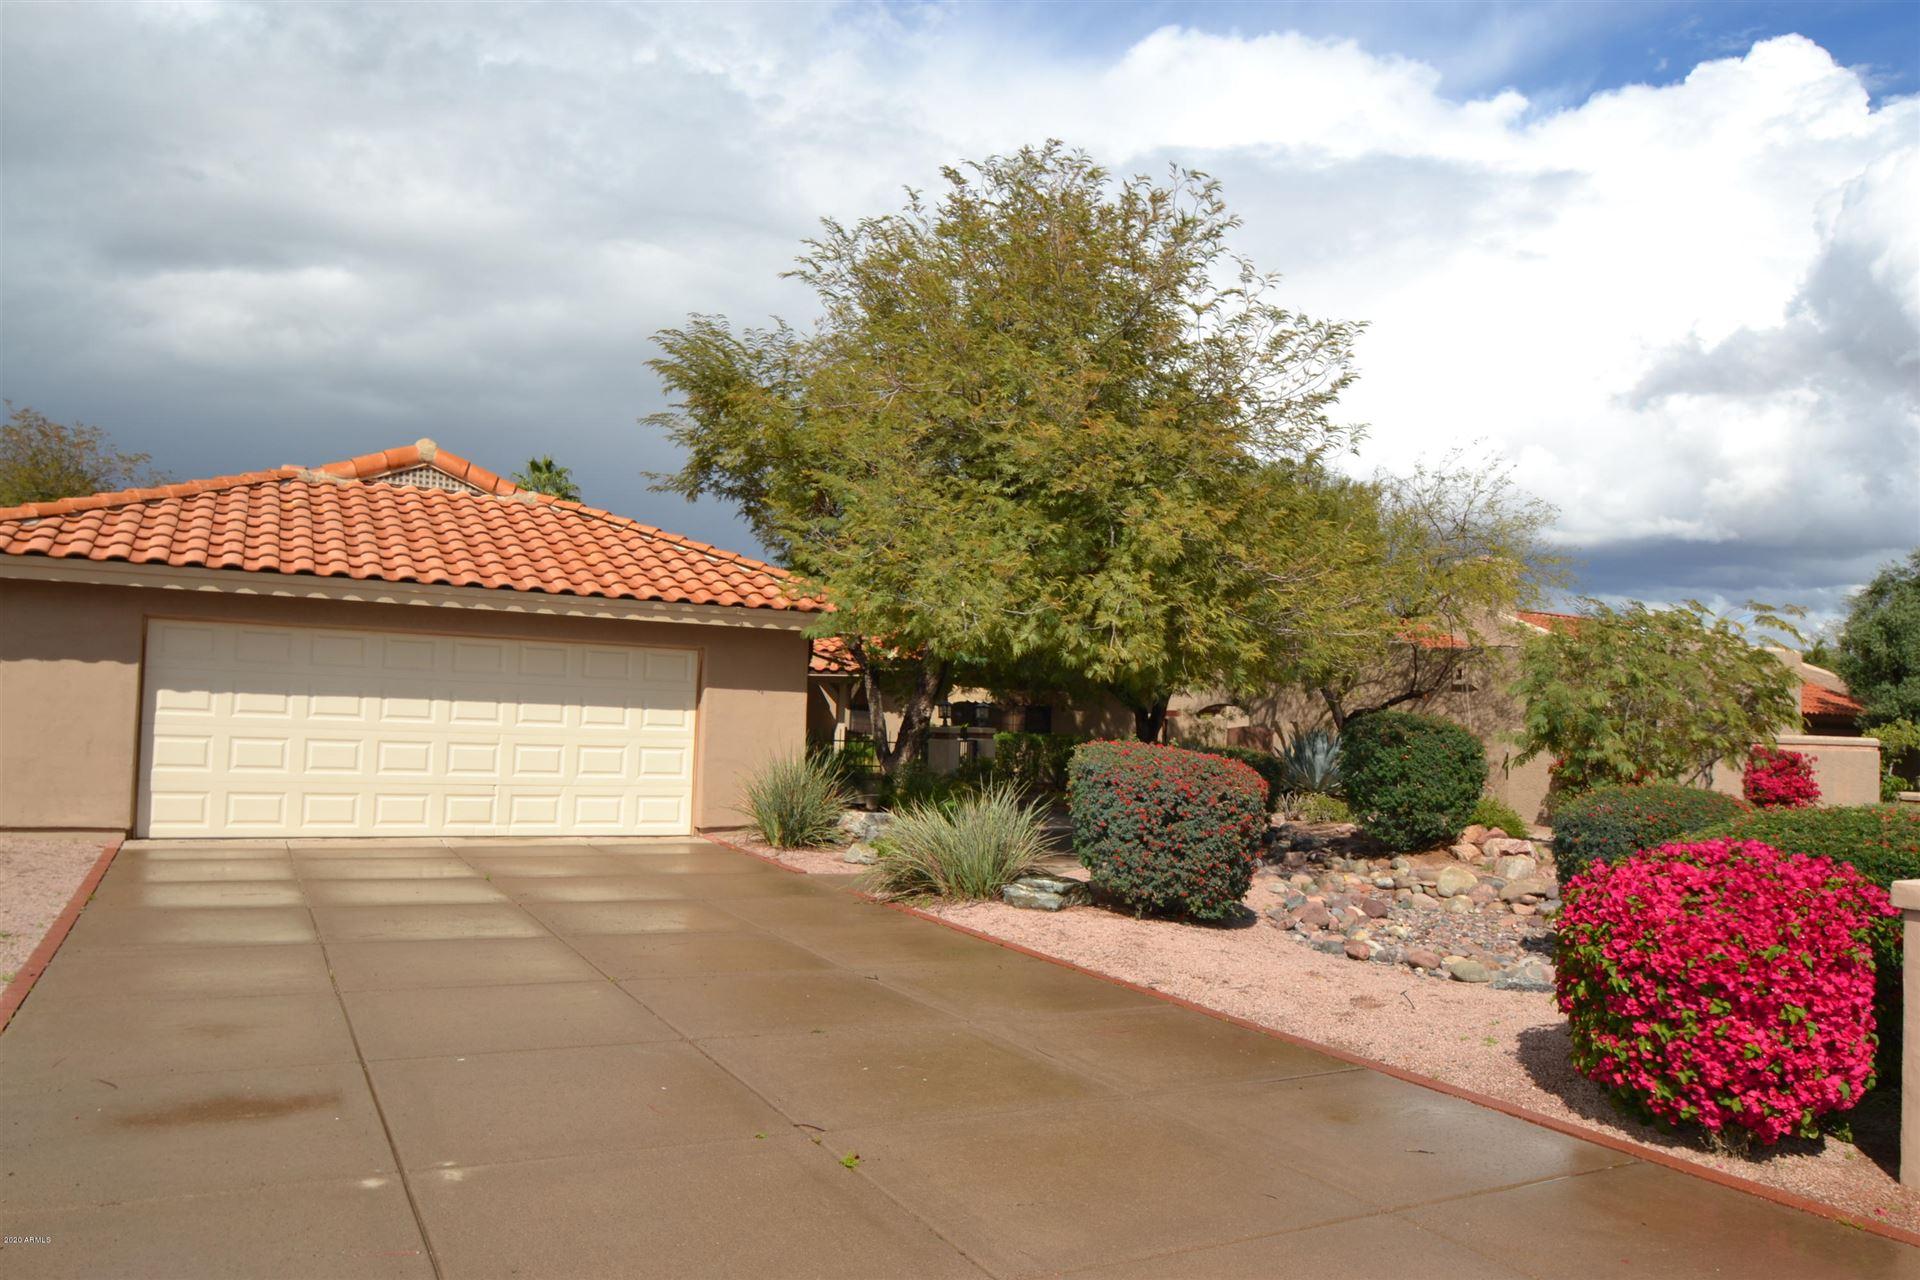 3746 E SEQUOIA Trail, Phoenix, AZ 85044 - #: 6049955